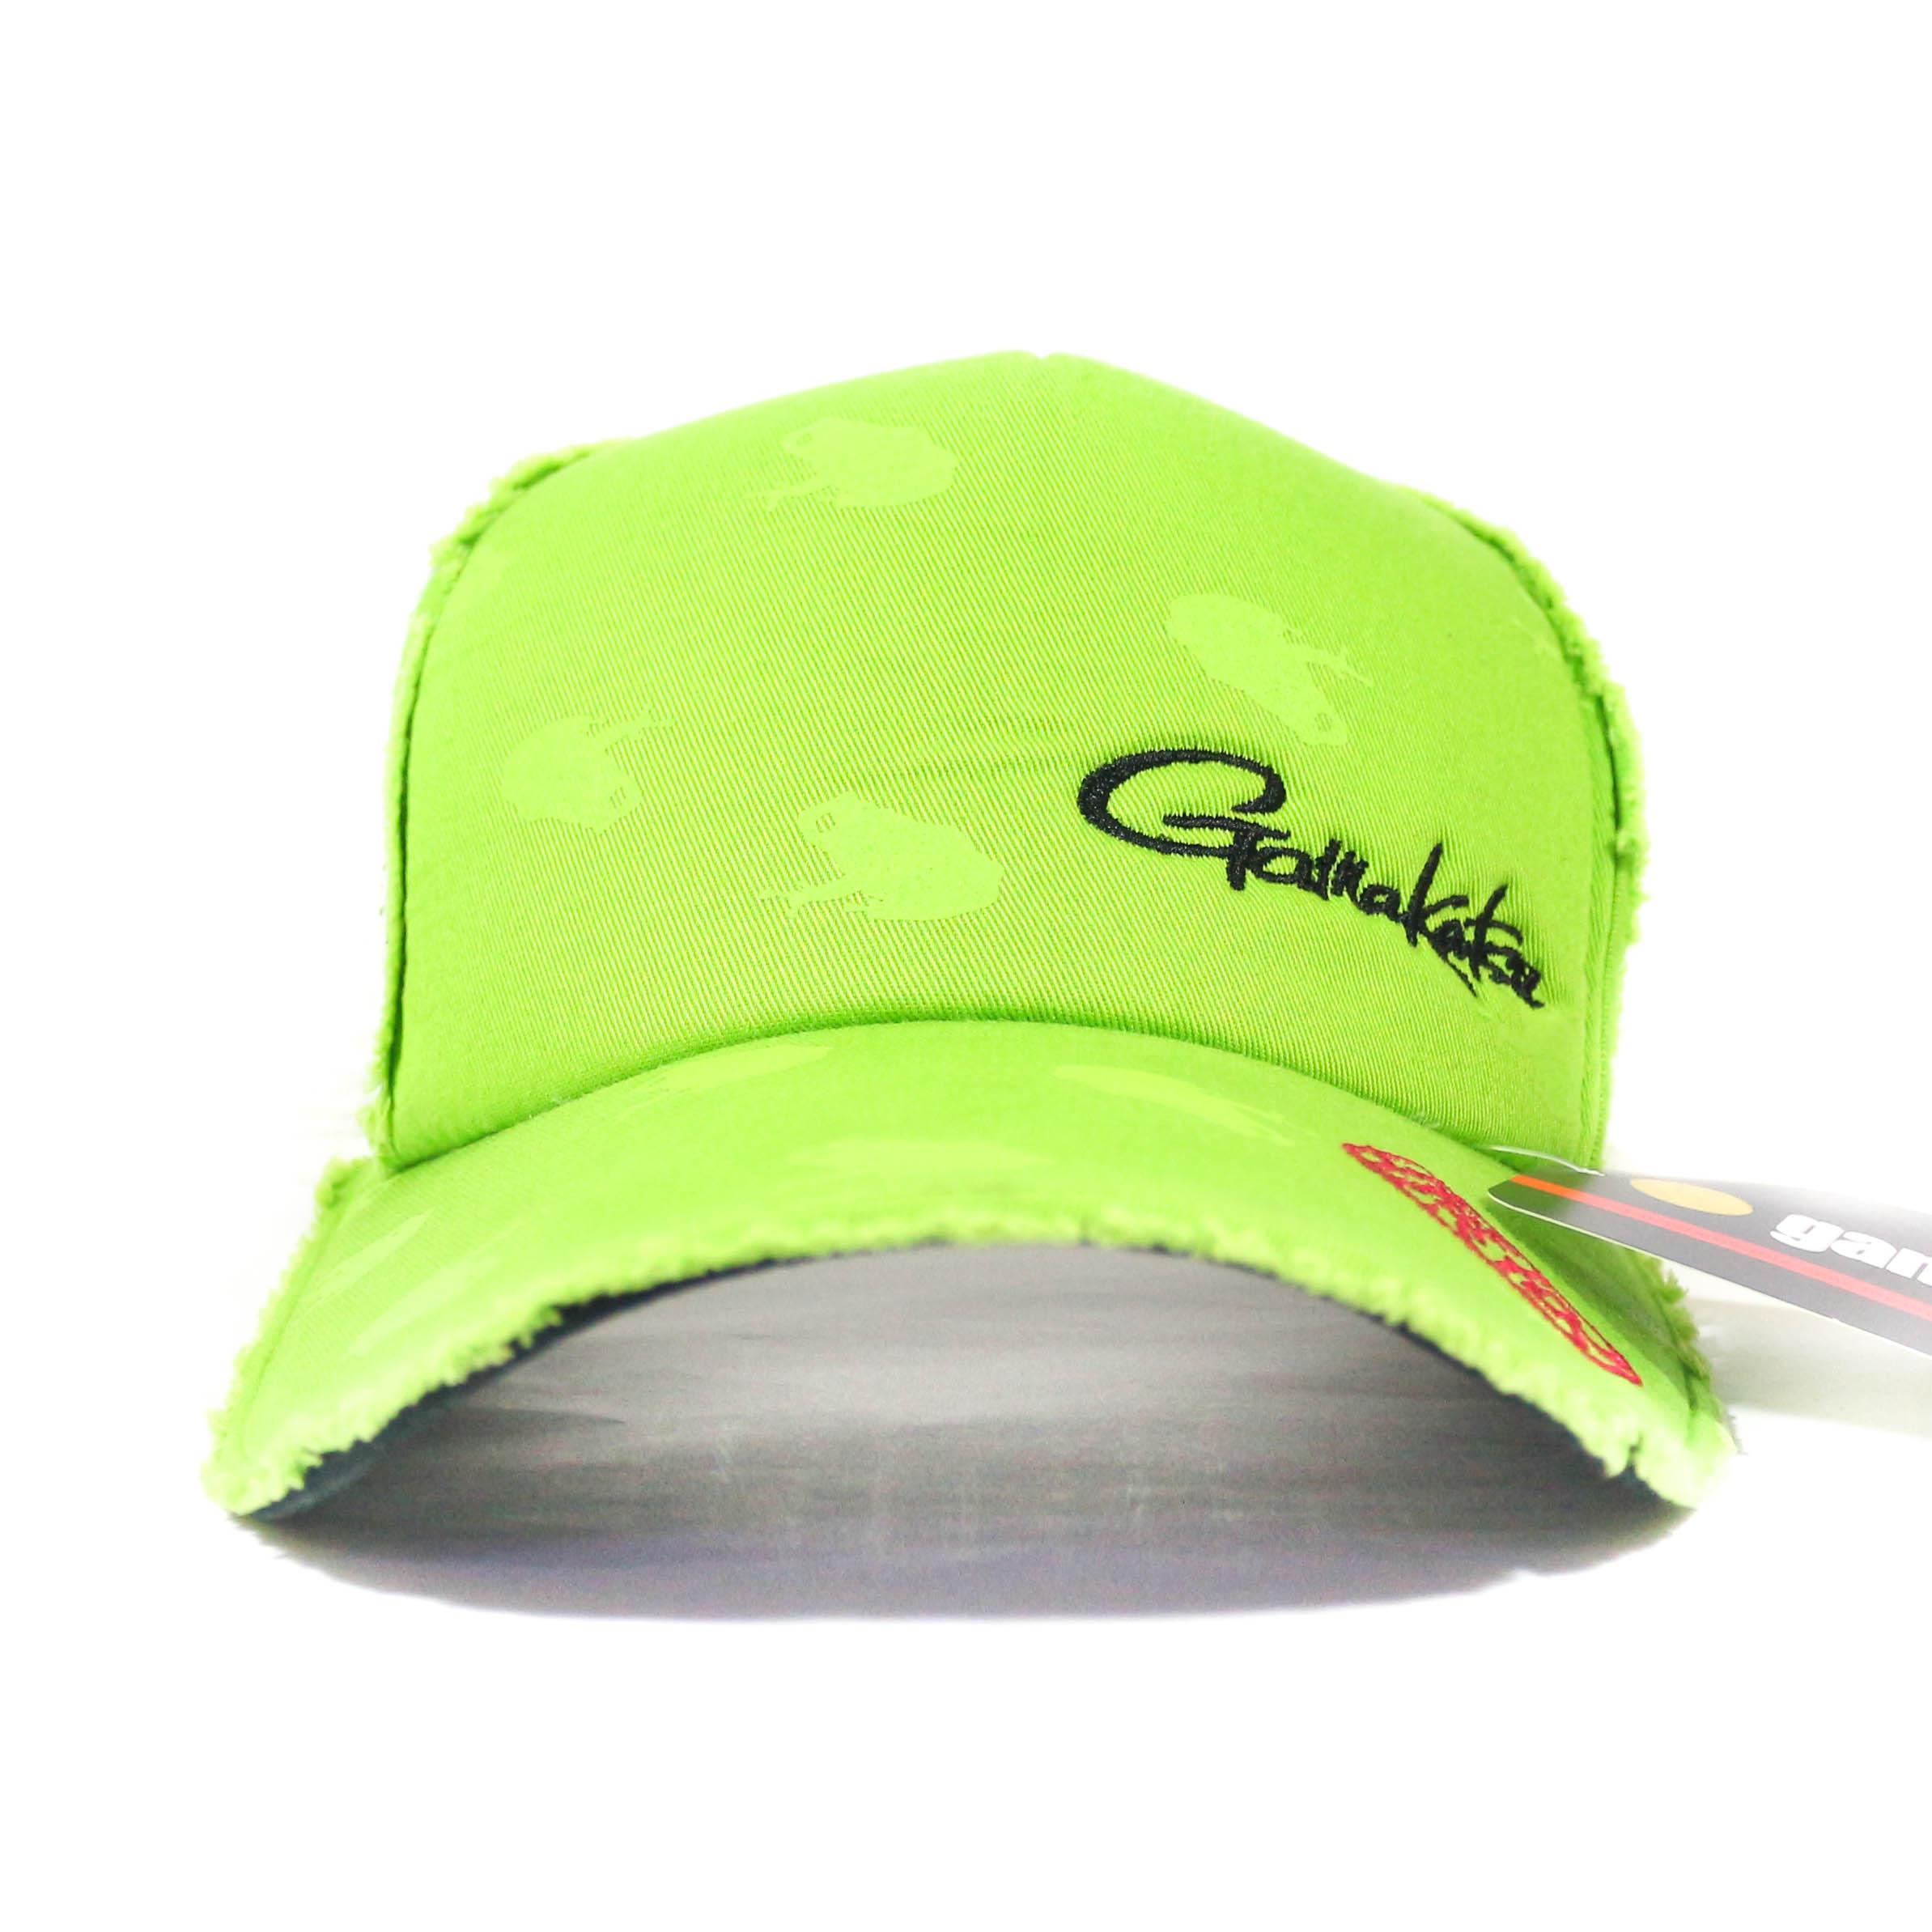 Gamakatsu GM-9776 Cap Damage Cap Free Size Green (5052)